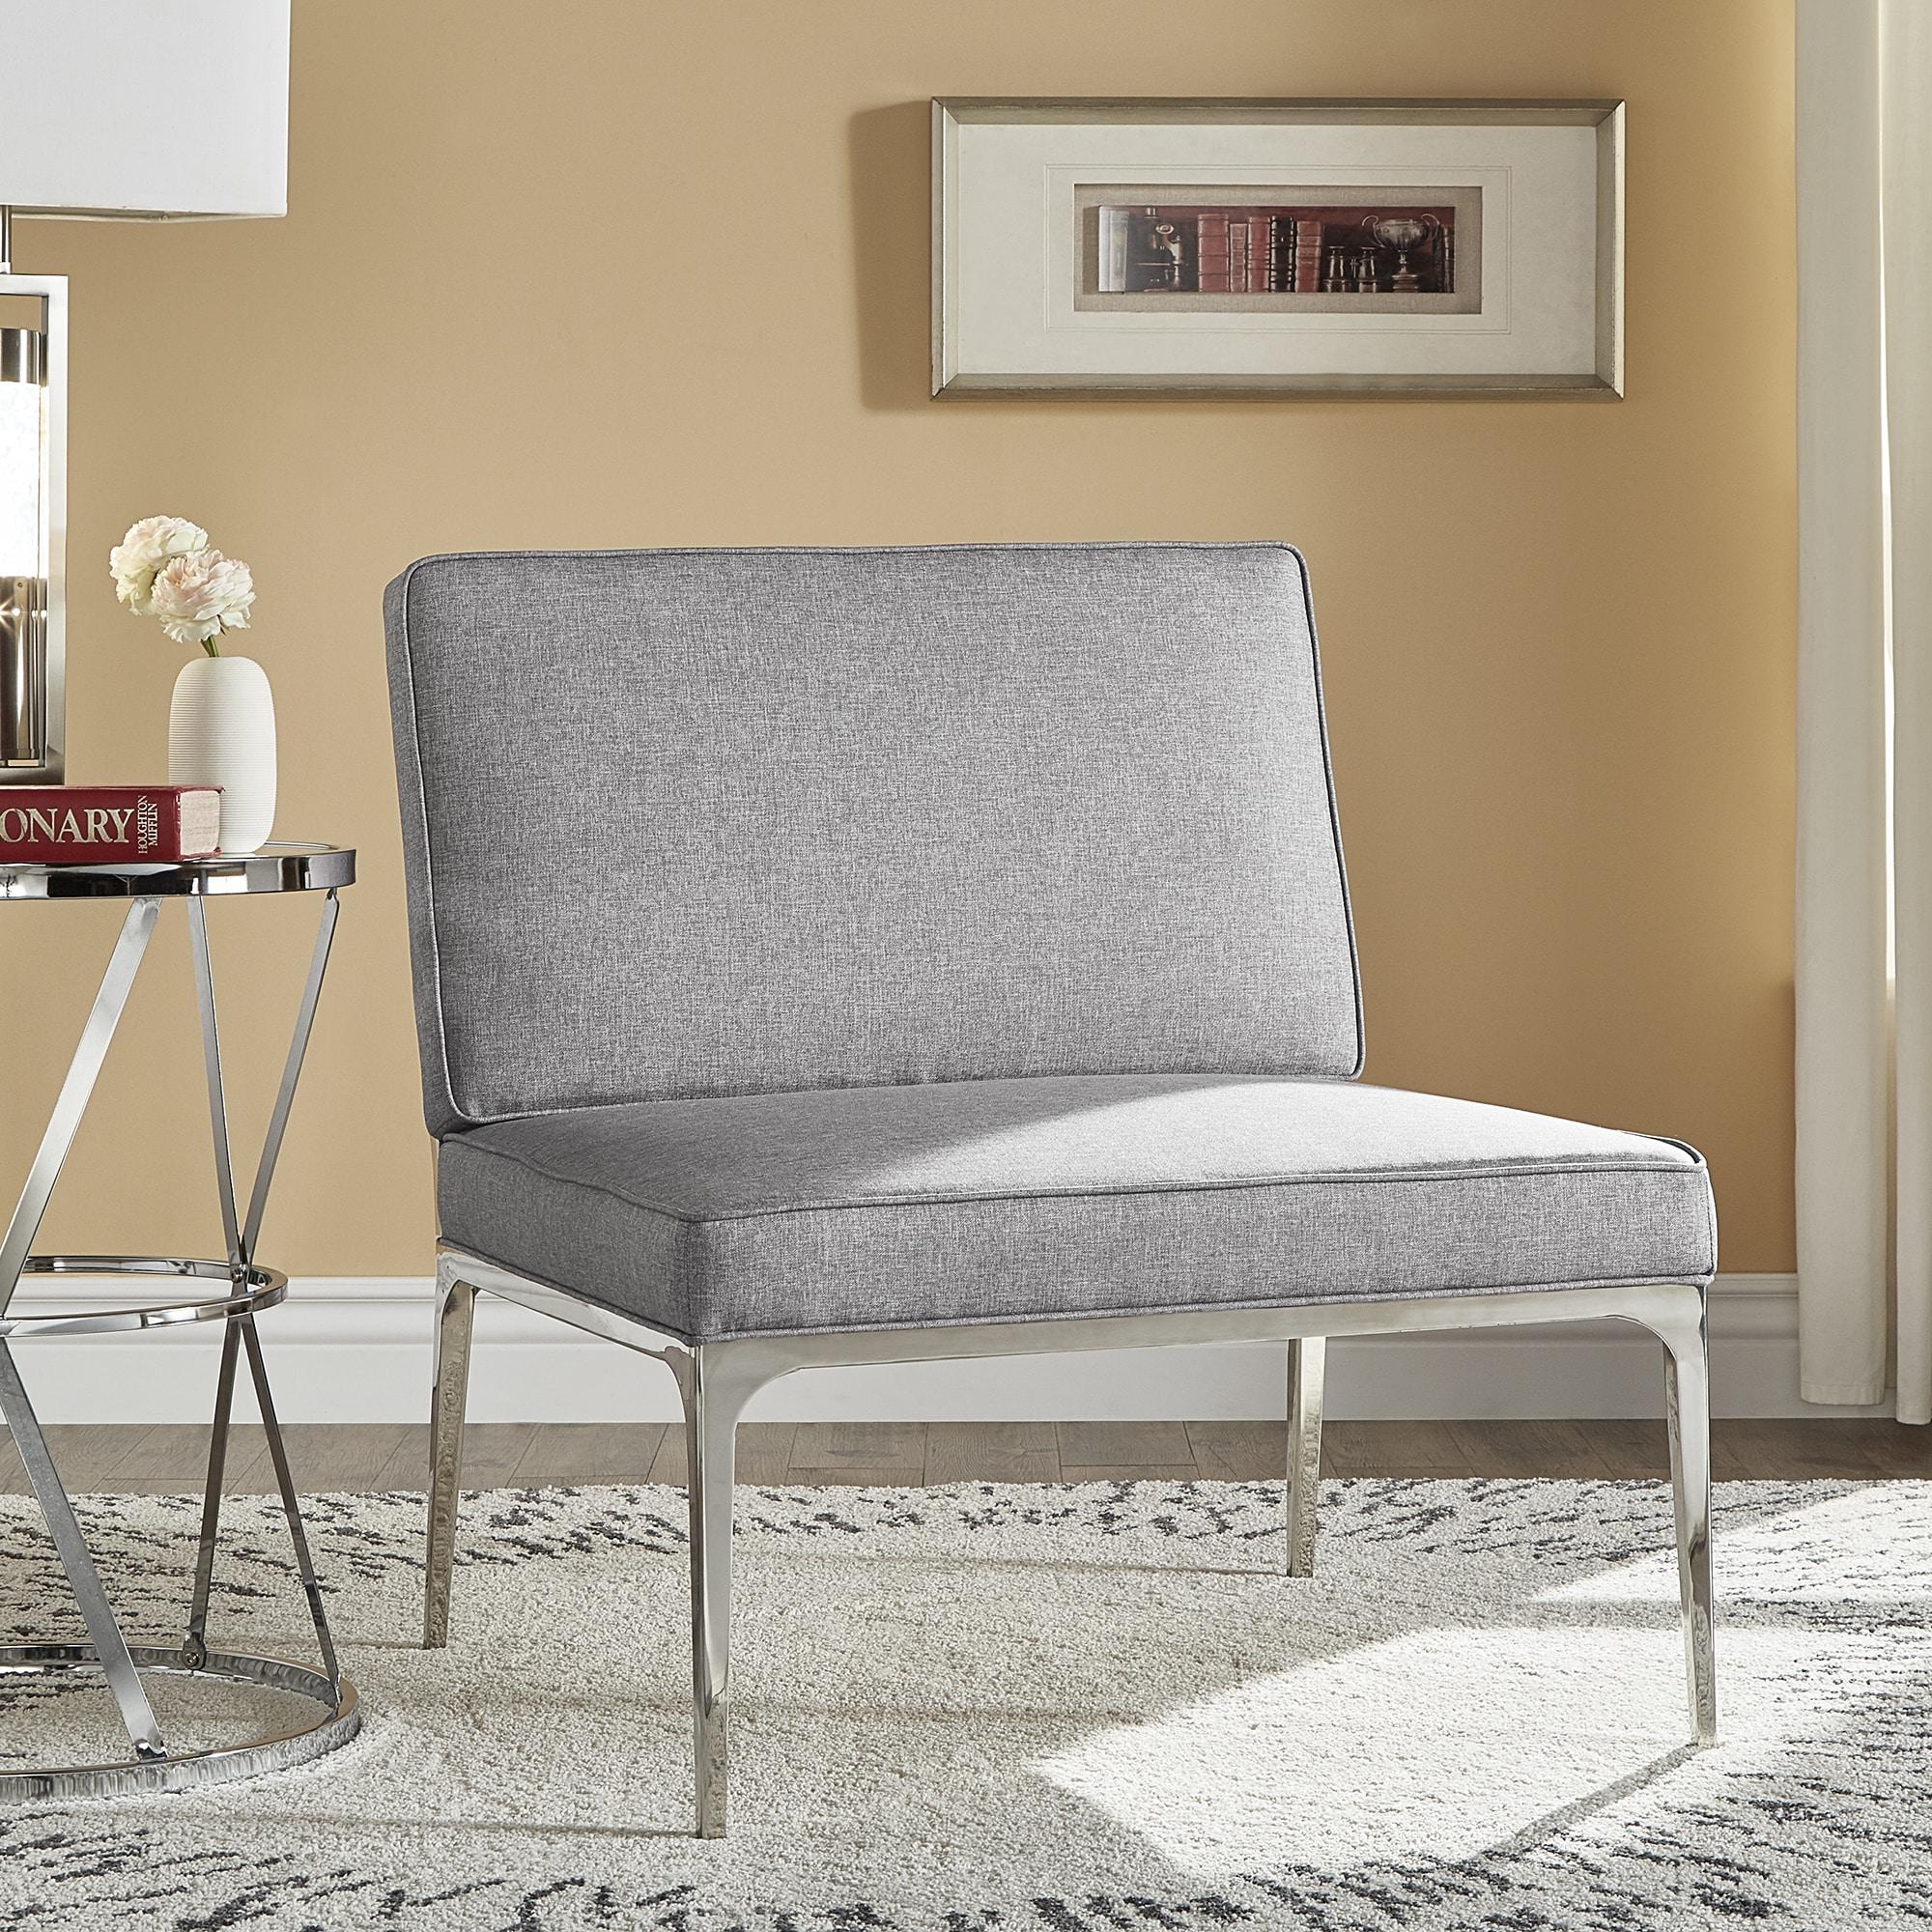 Pleasing Dylan Grey Linen Armless Chrome Accent Chair By Inspire Q Modern 79 X 1010 Cjindustries Chair Design For Home Cjindustriesco